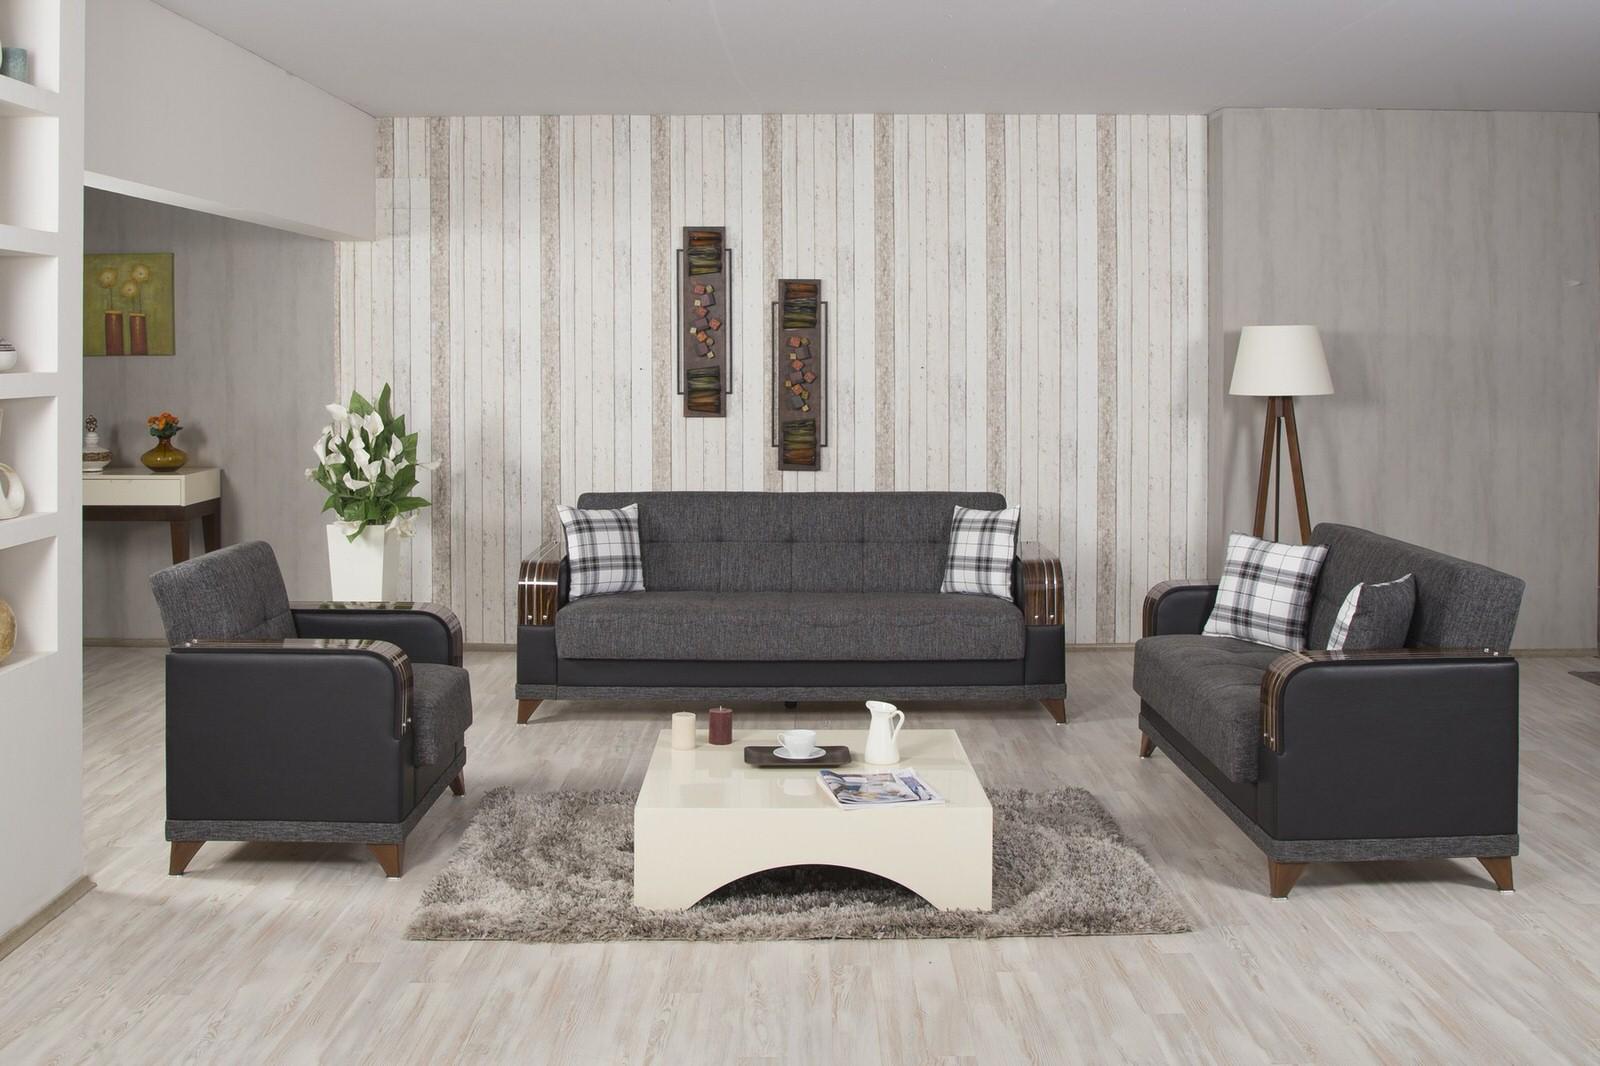 Almira Elena Gray Convertible Sofa Bed By Casamode